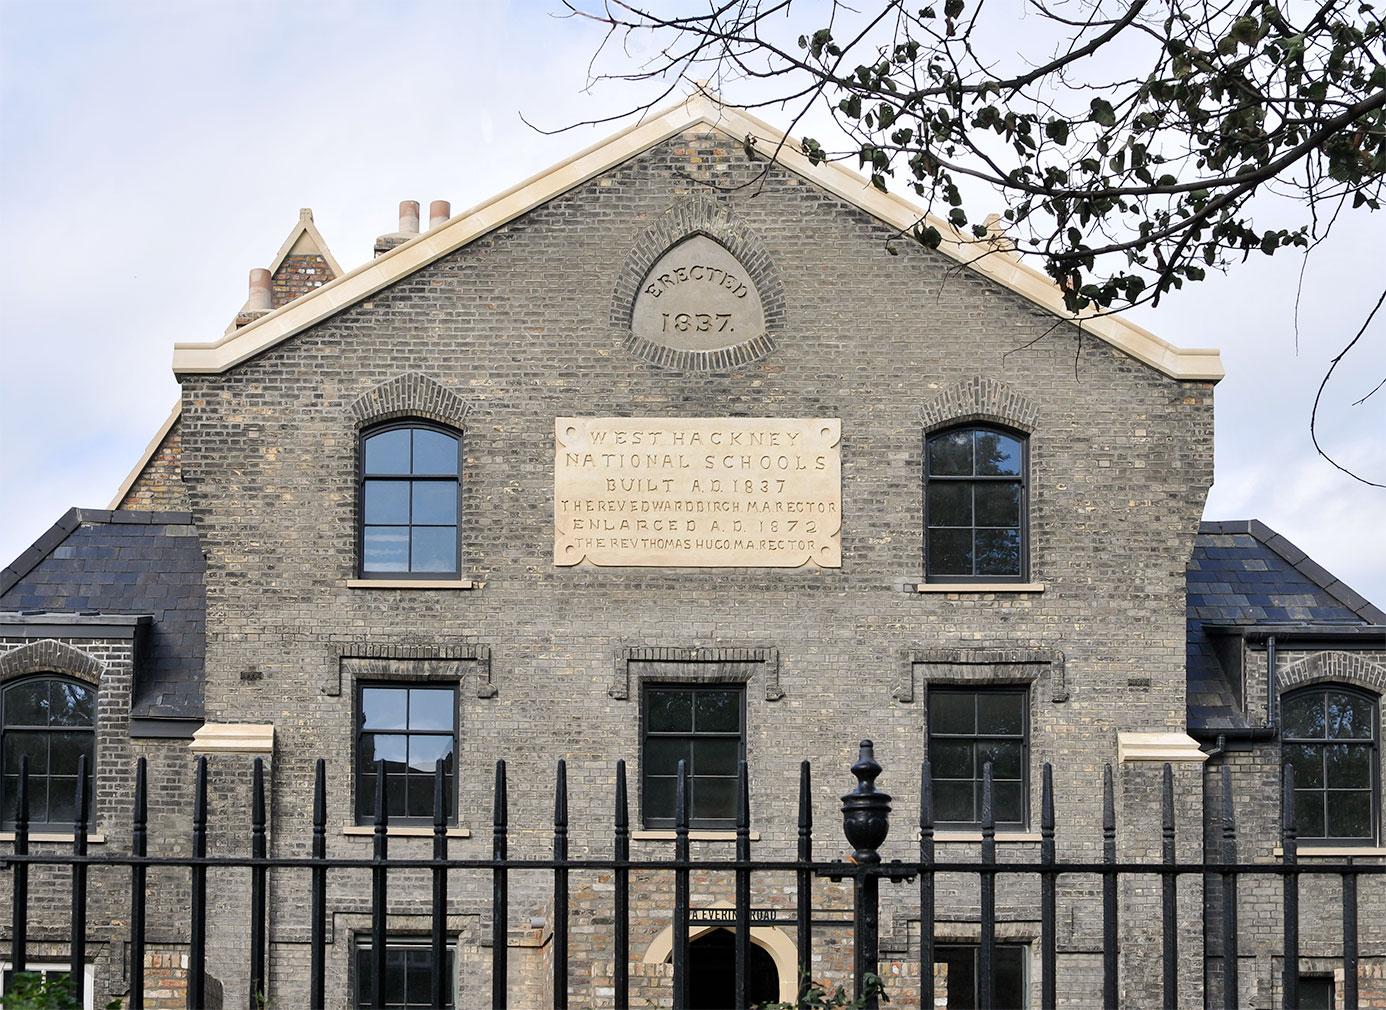 Grange Hall in London